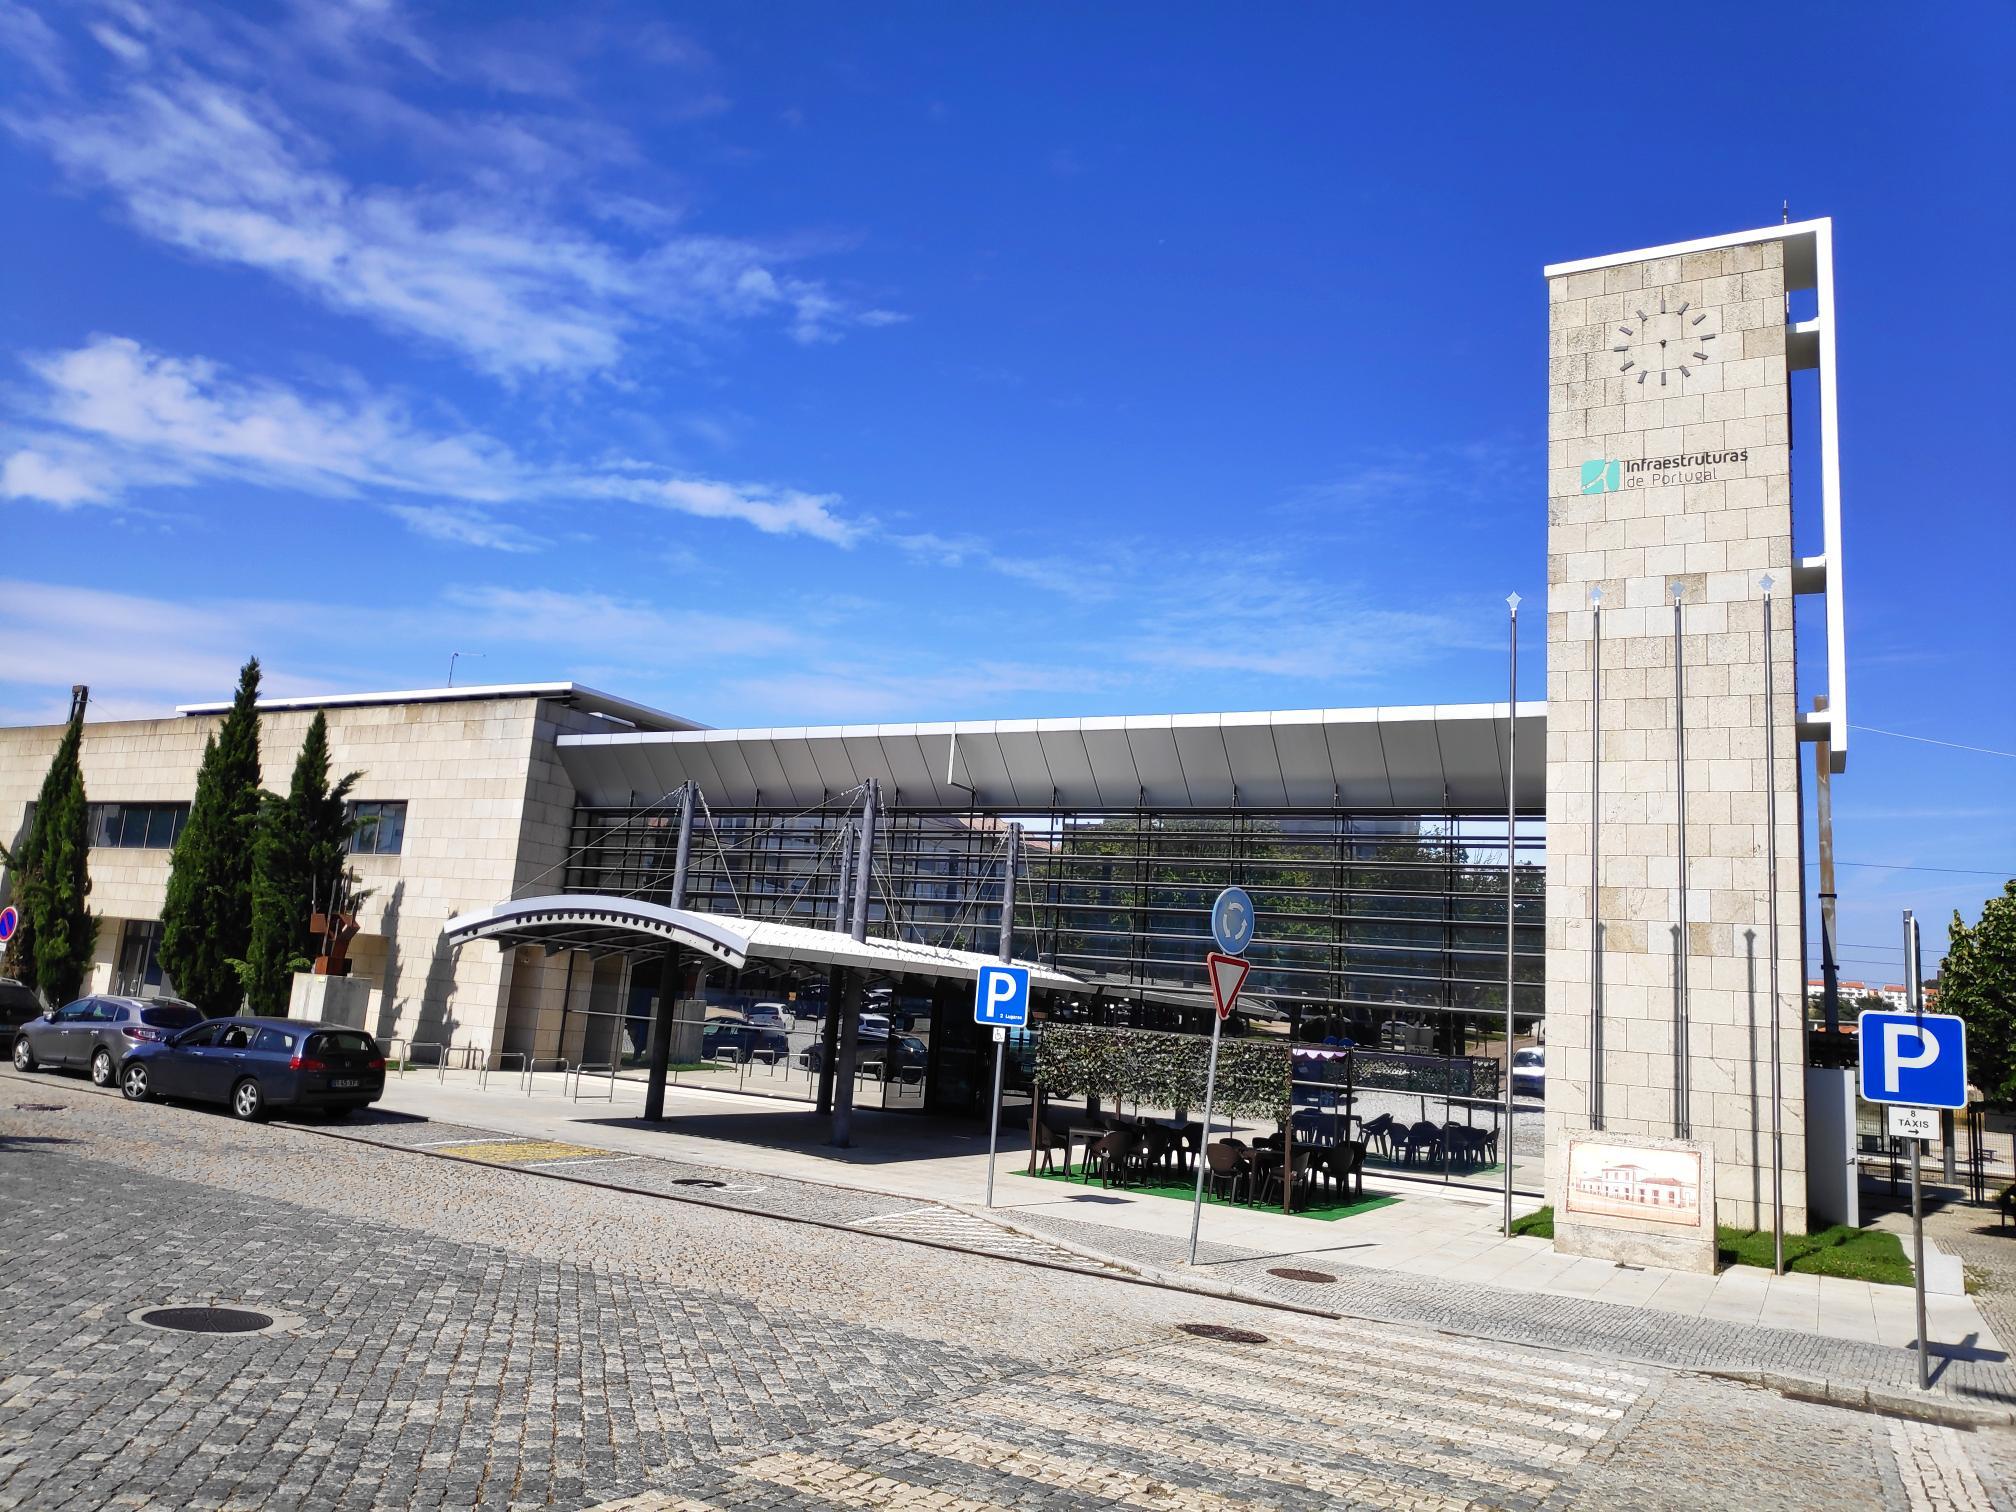 Visita sindical à Guarda, edifício principal.